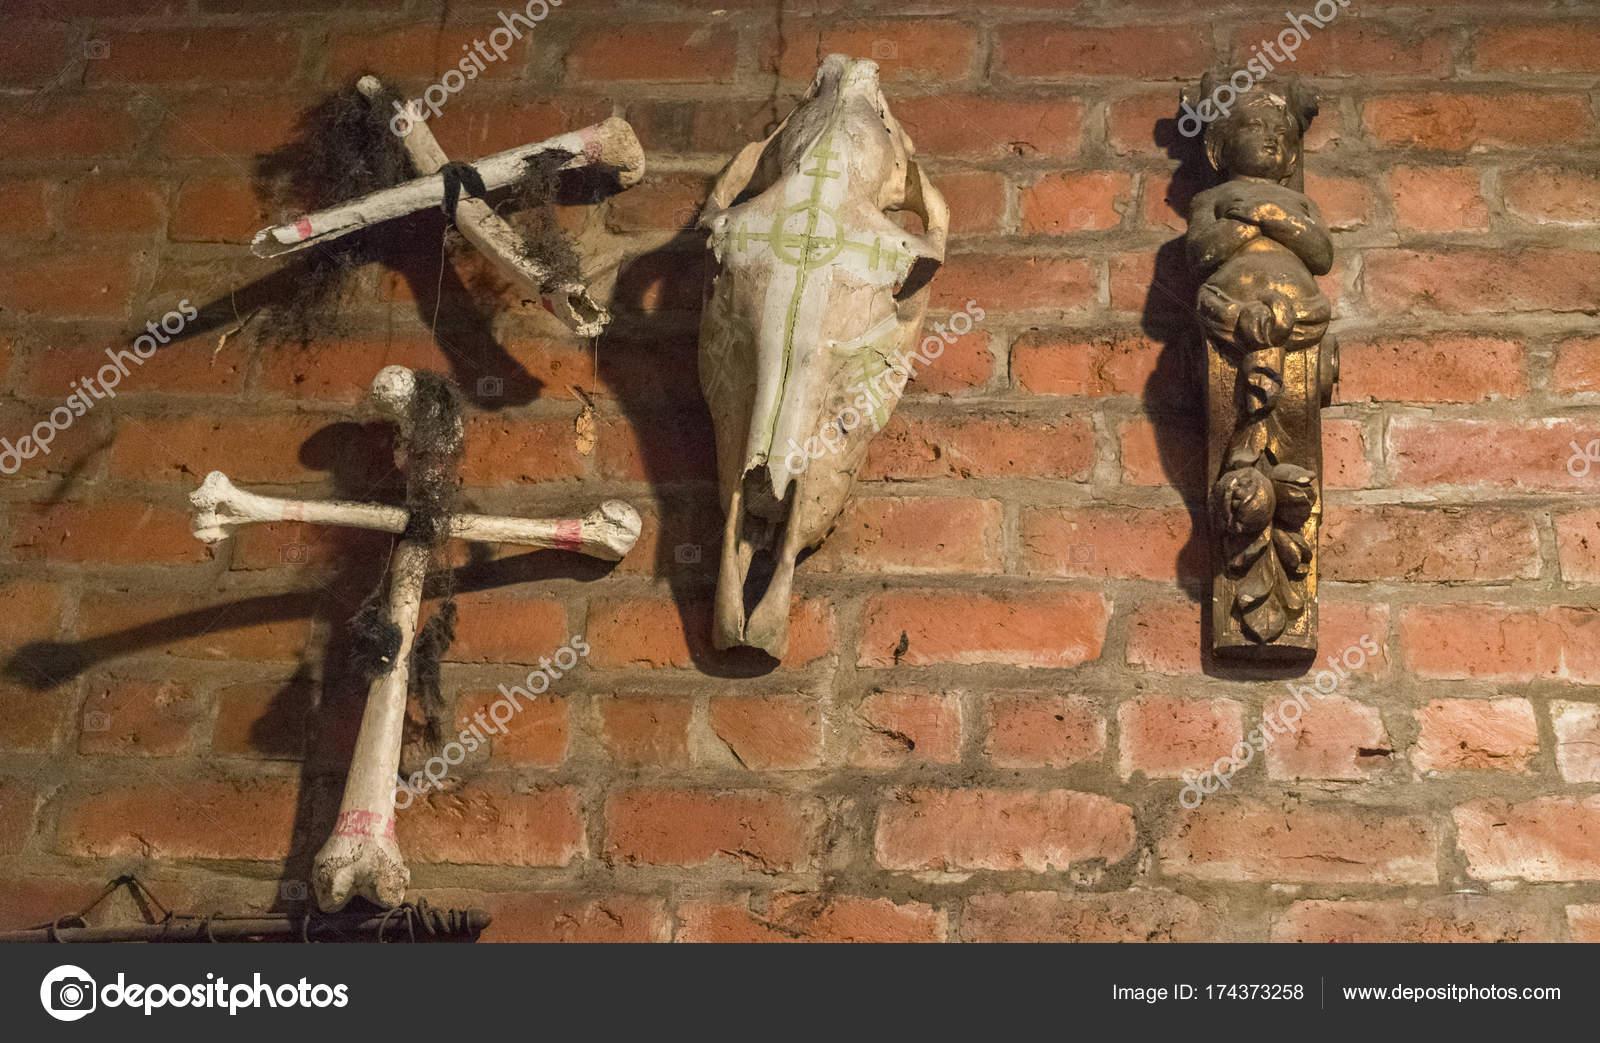 Ritual attributes of voodoo religion  Skulls and bones